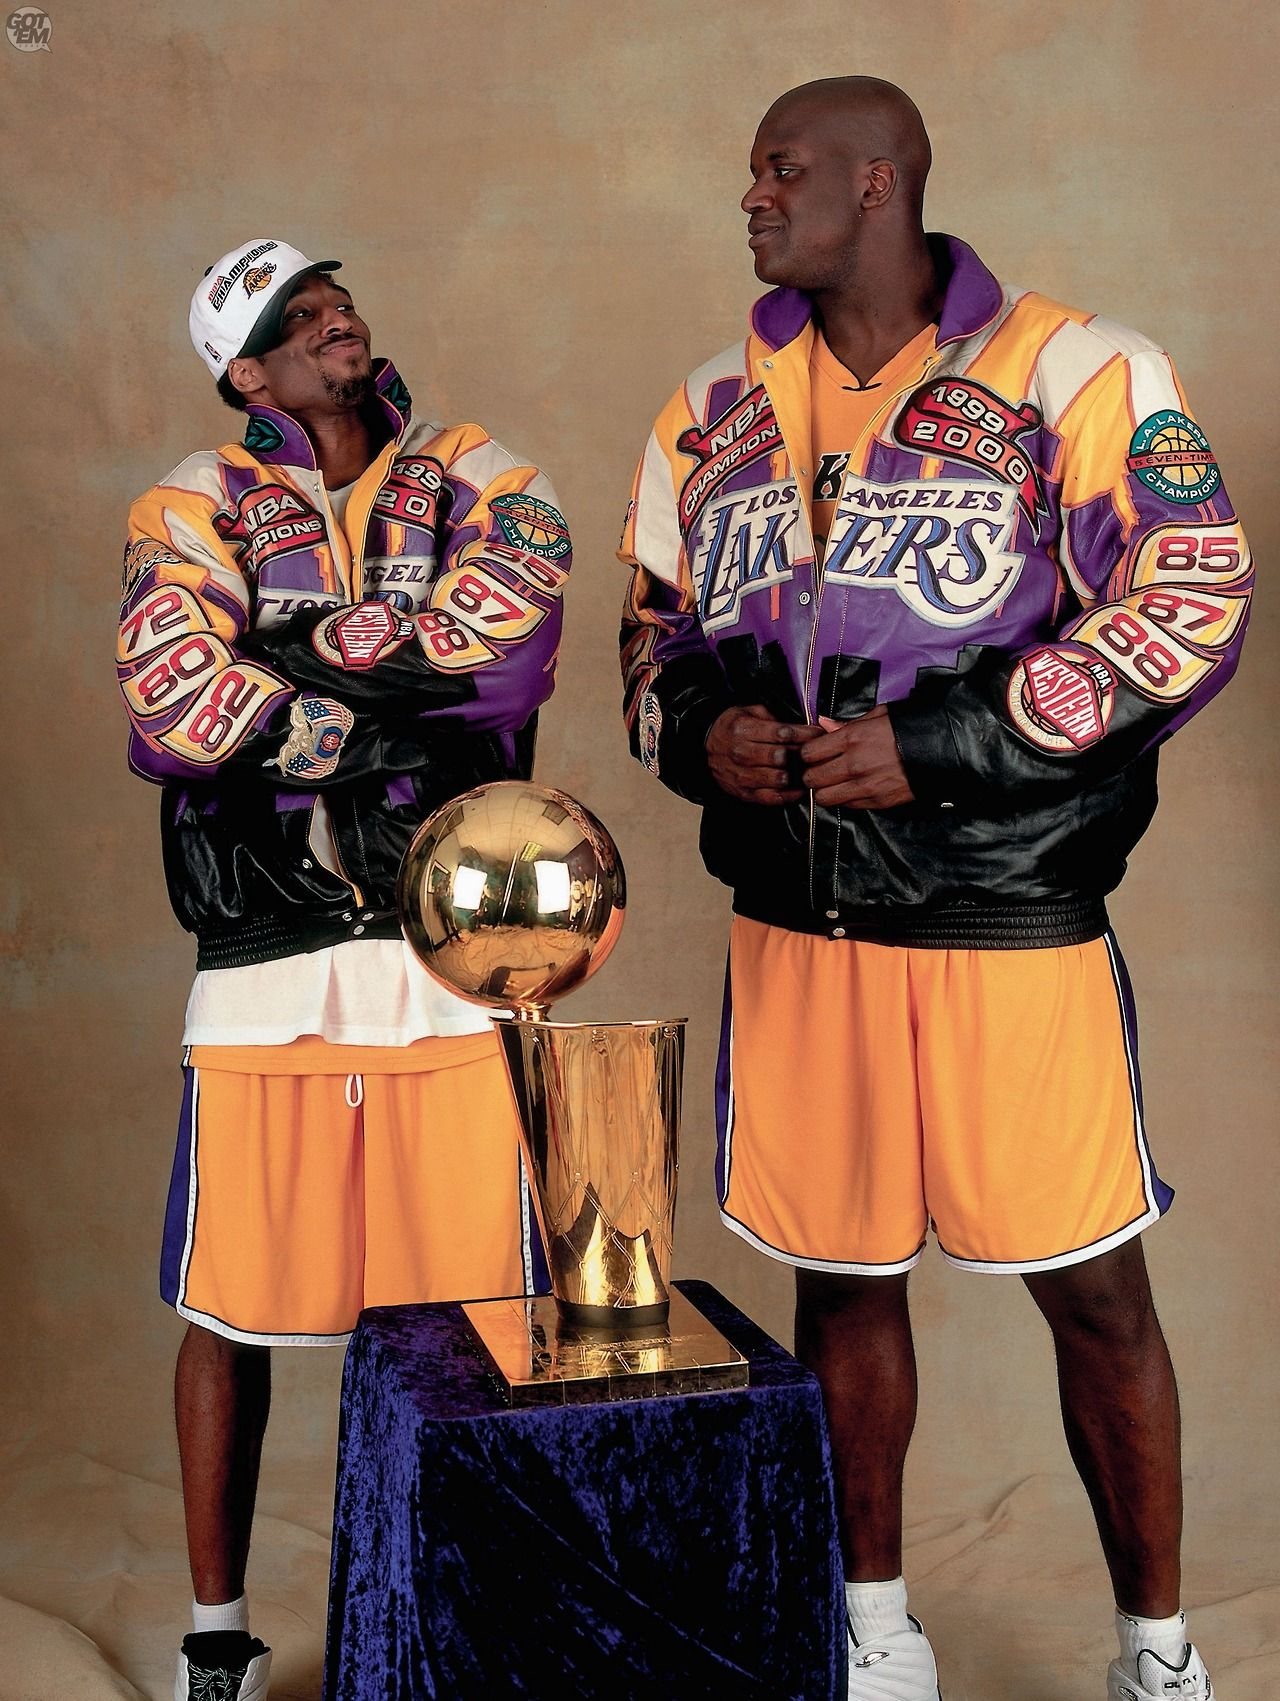 Kobe Bryant Championship Jacket Wallpaper : bryant, championship, jacket, wallpaper, Gotemcoach, Lakers, Kobe,, Bryant, Pictures,